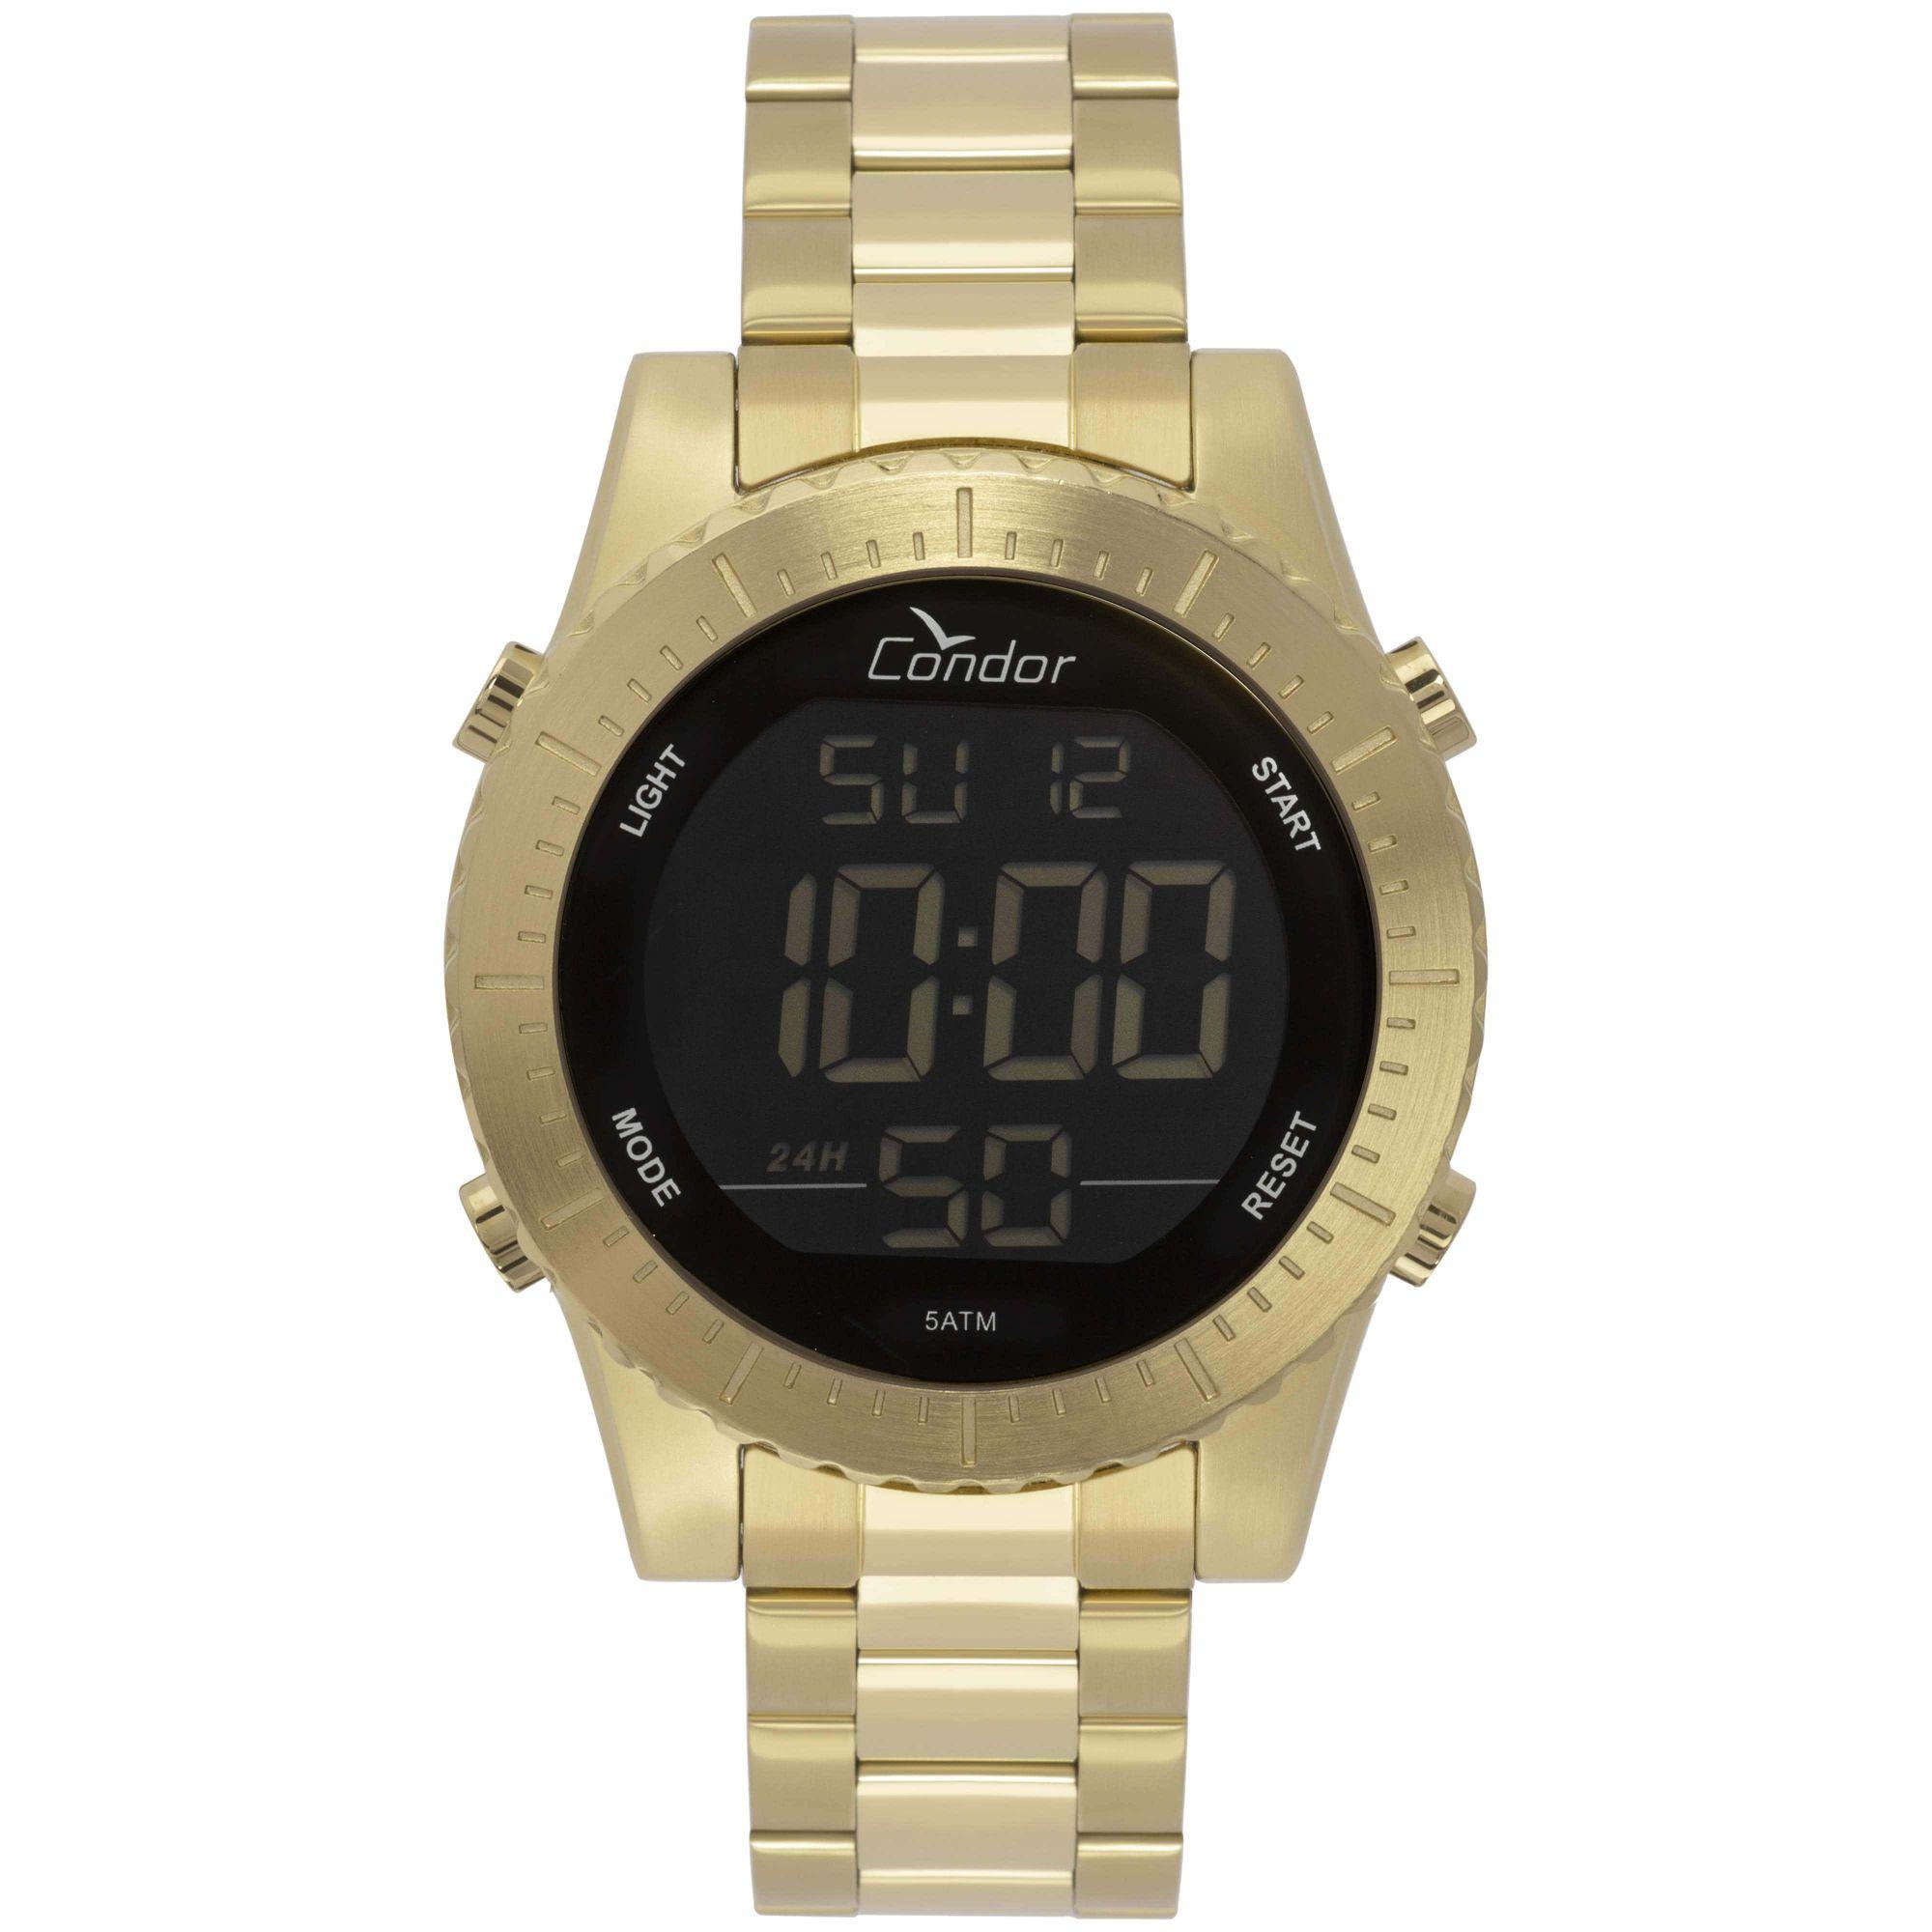 Relógio Condor Masculino Digital Casual Dourado COBJ3463AA/4D